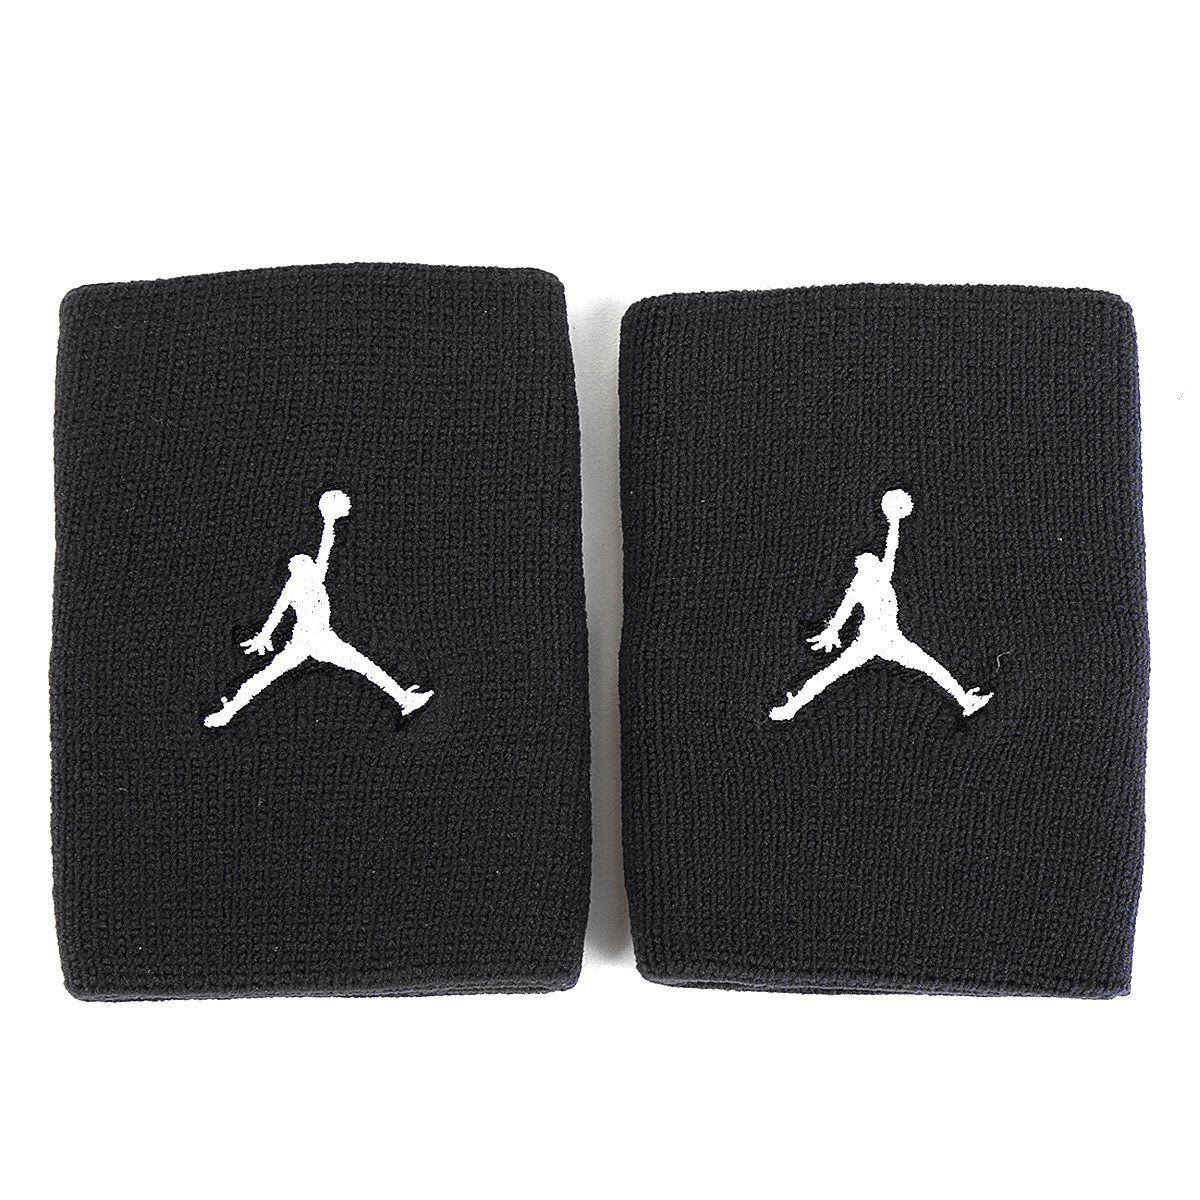 Munhequeira Nike Jordan Jumpman Doublewide - Preto